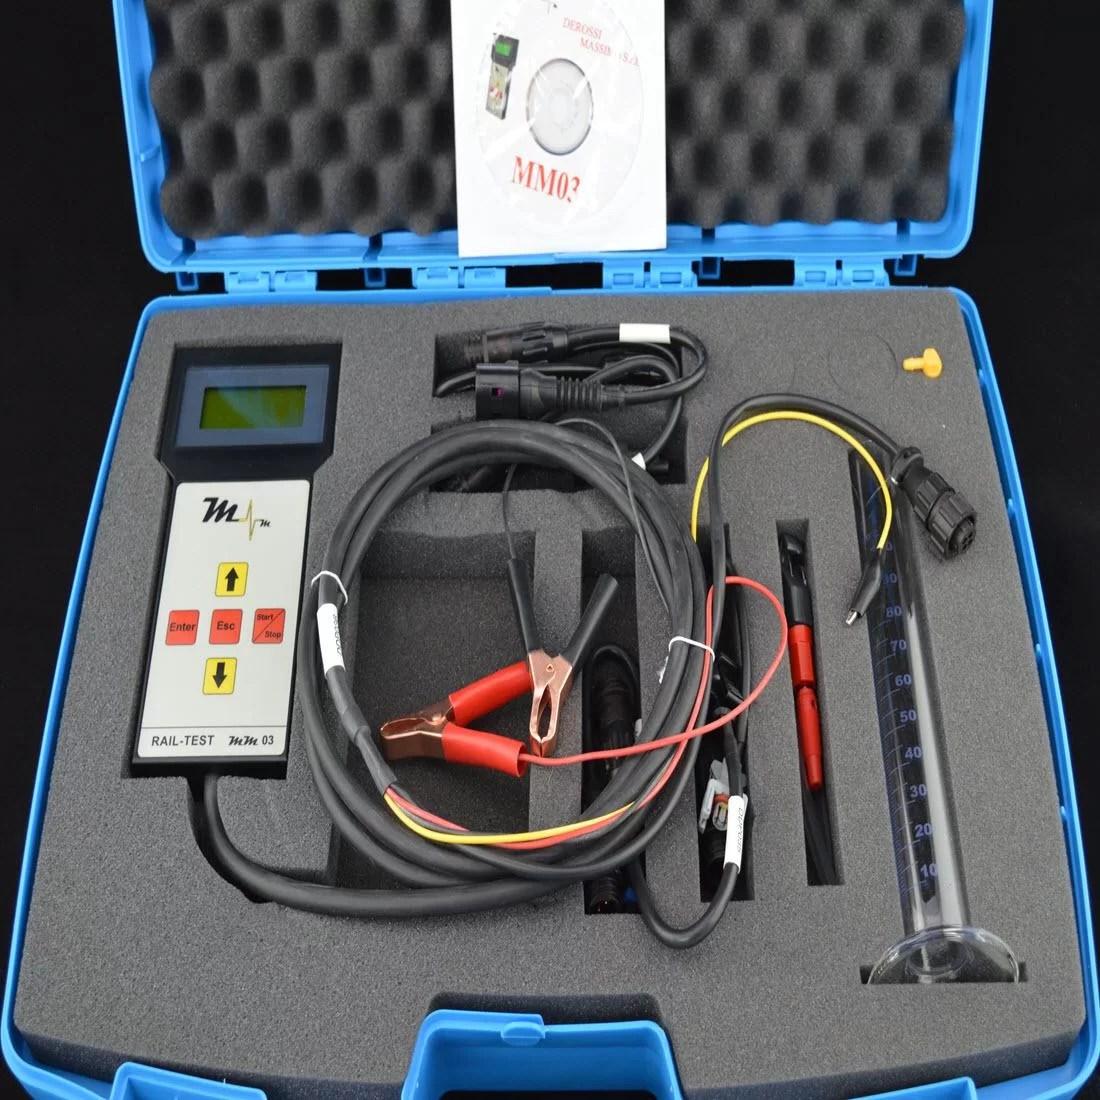 o2 sensor heater 586b wiring diagram list of common rail / diesel test equipment for sale - ryansautomotive.ie